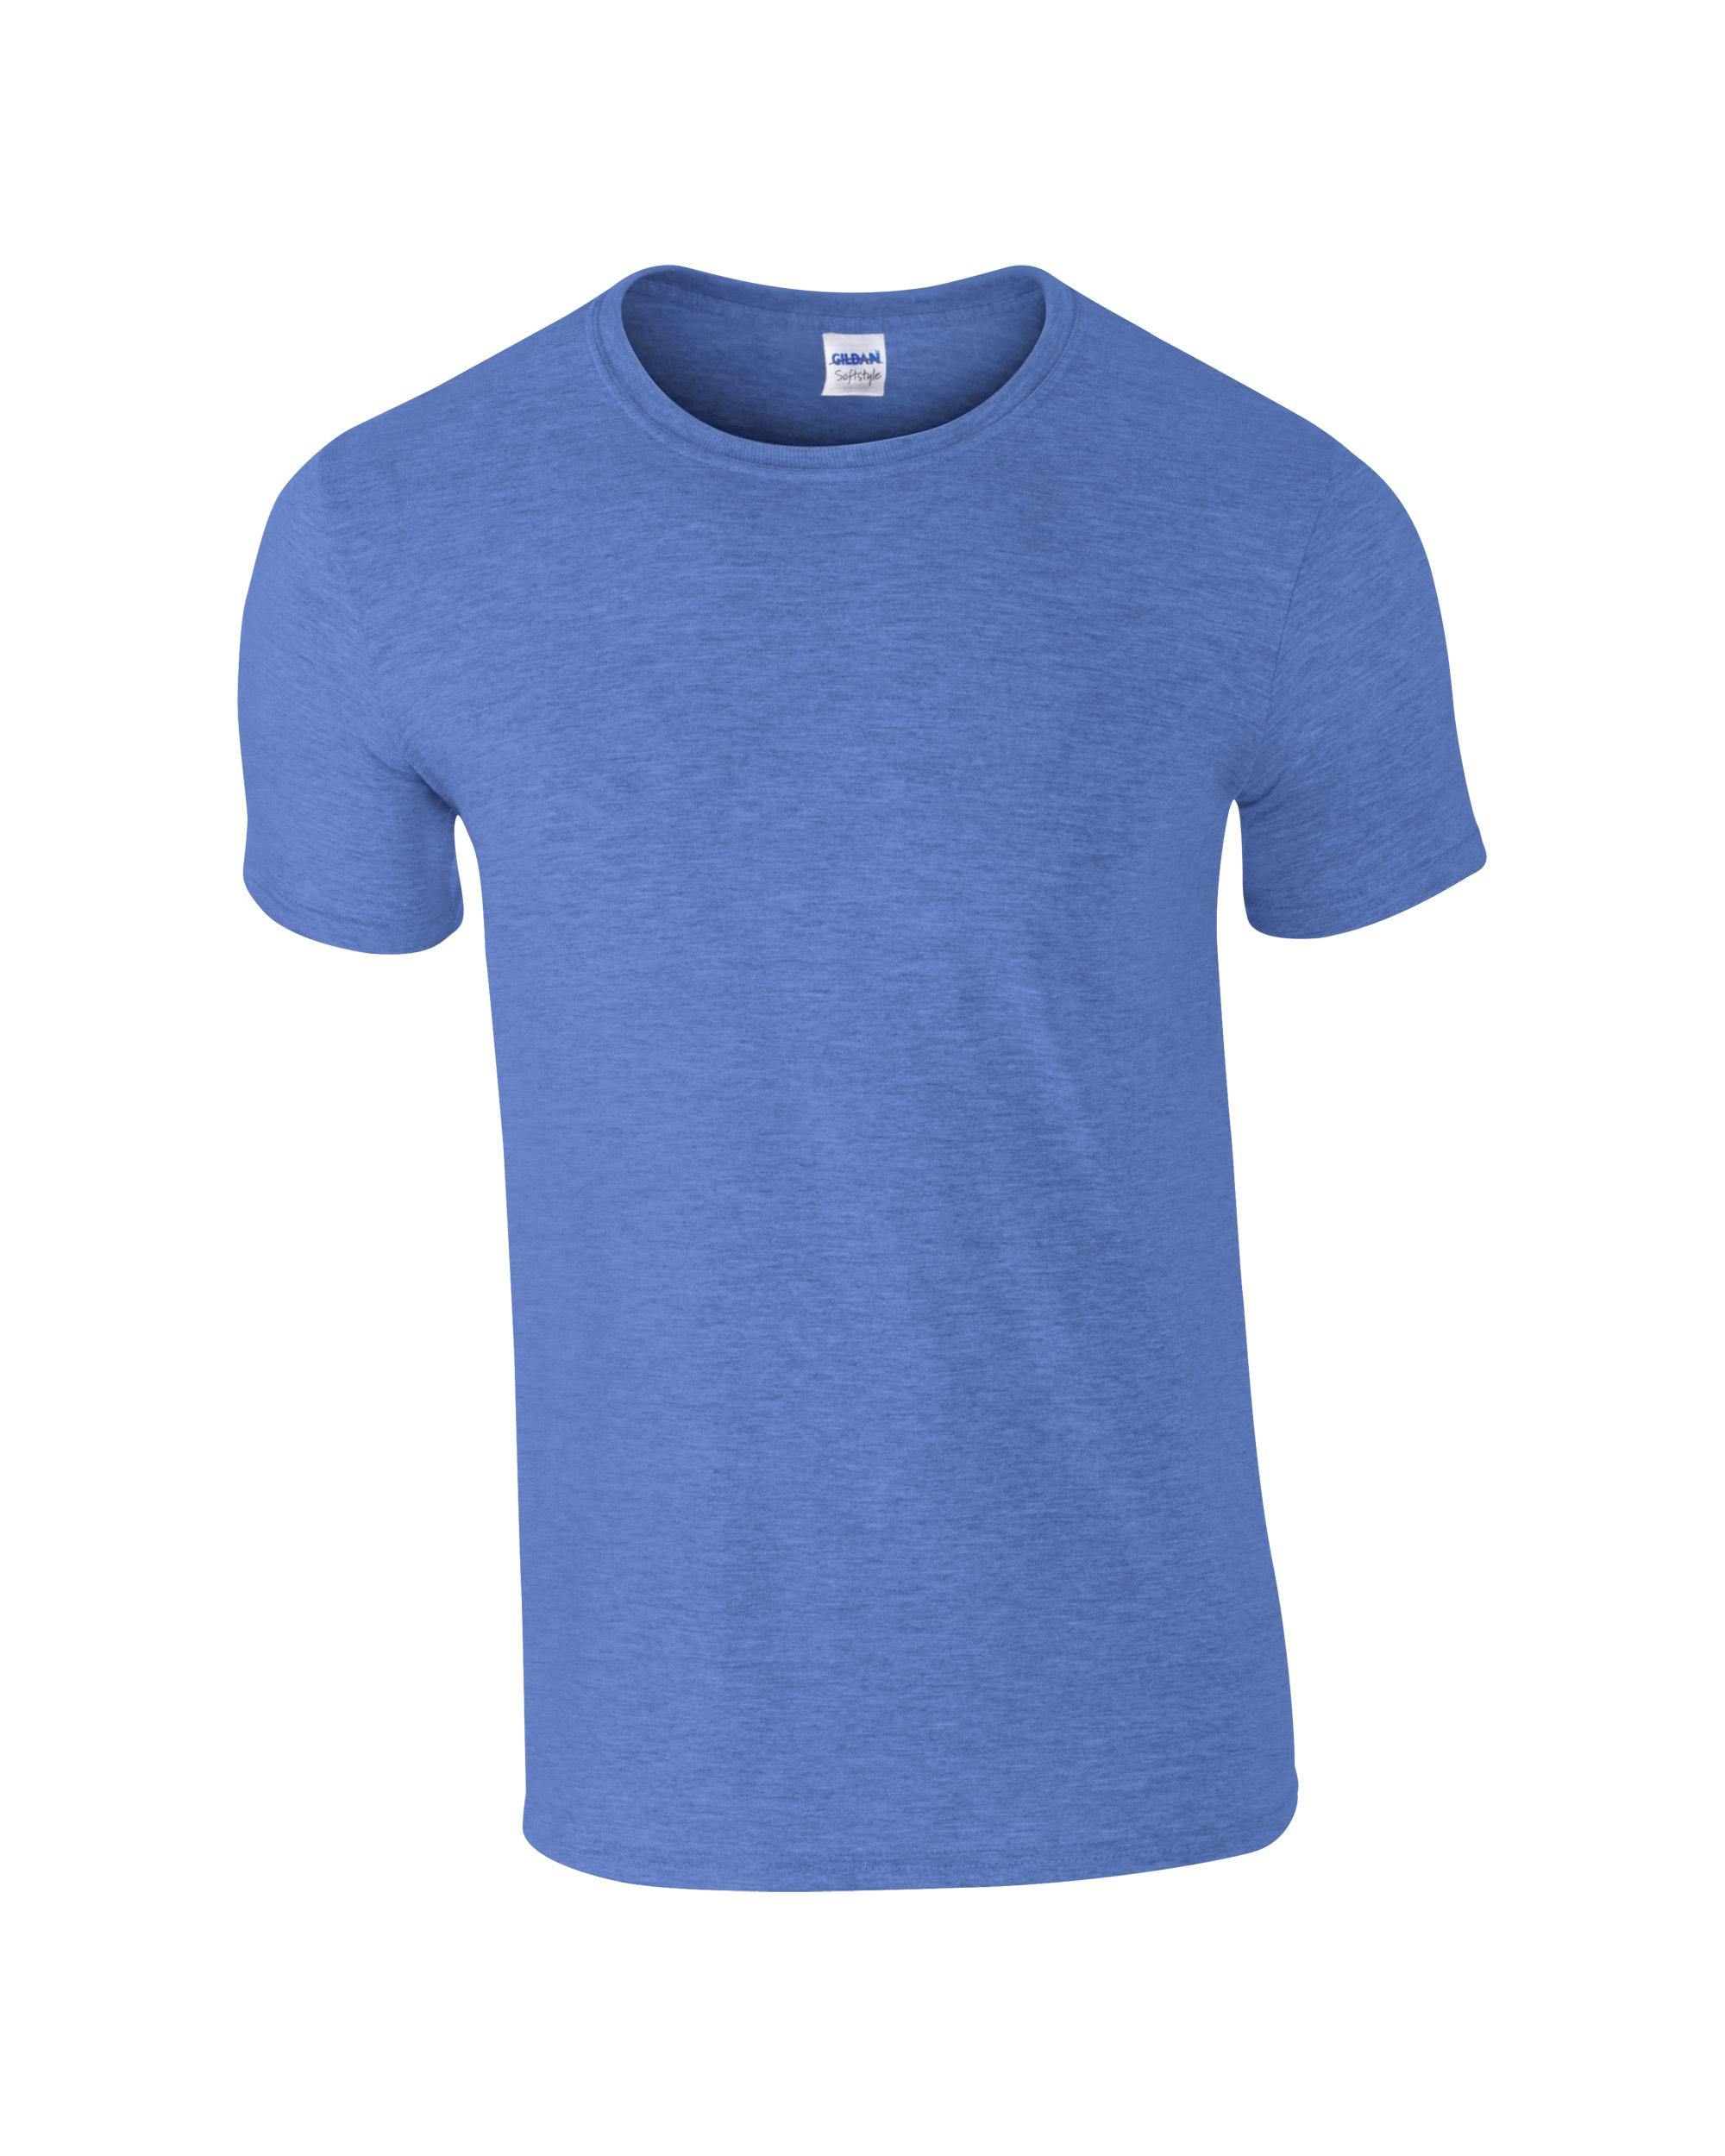 Majca kratki rukav t-shirt, muška, indigo plava